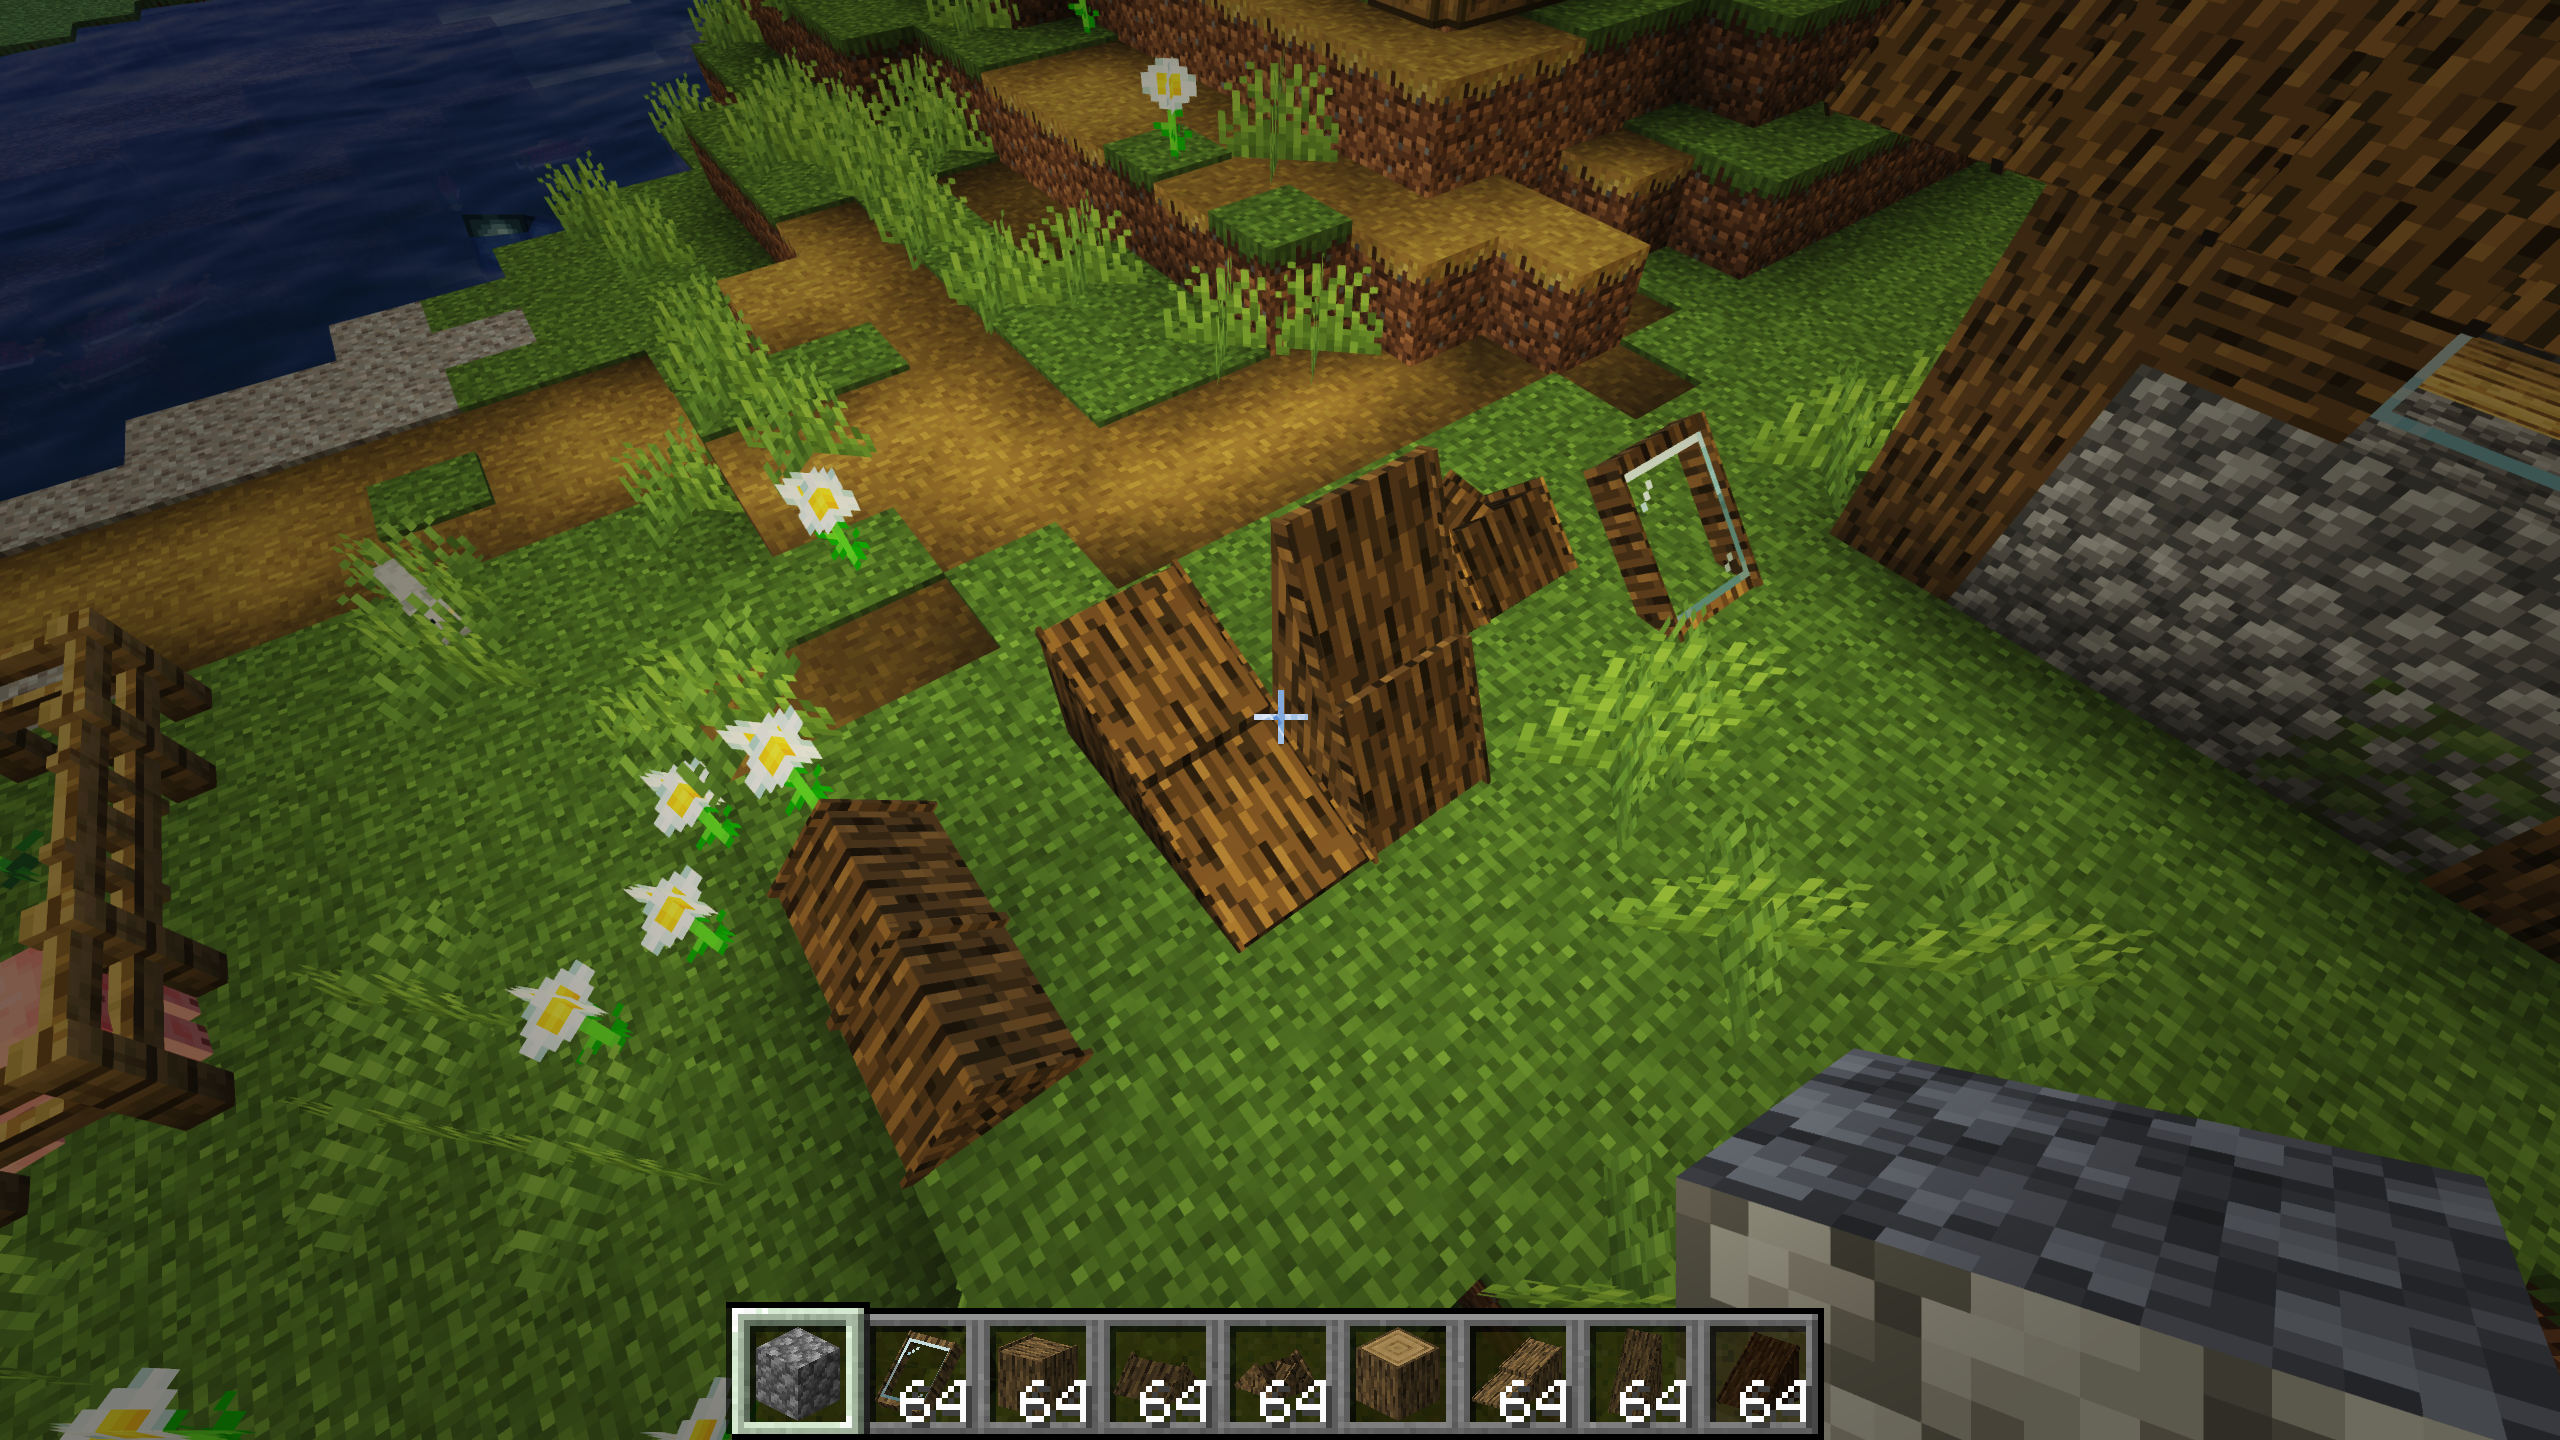 Мод на крышу «Macaw's Roofs» - скриншот 2